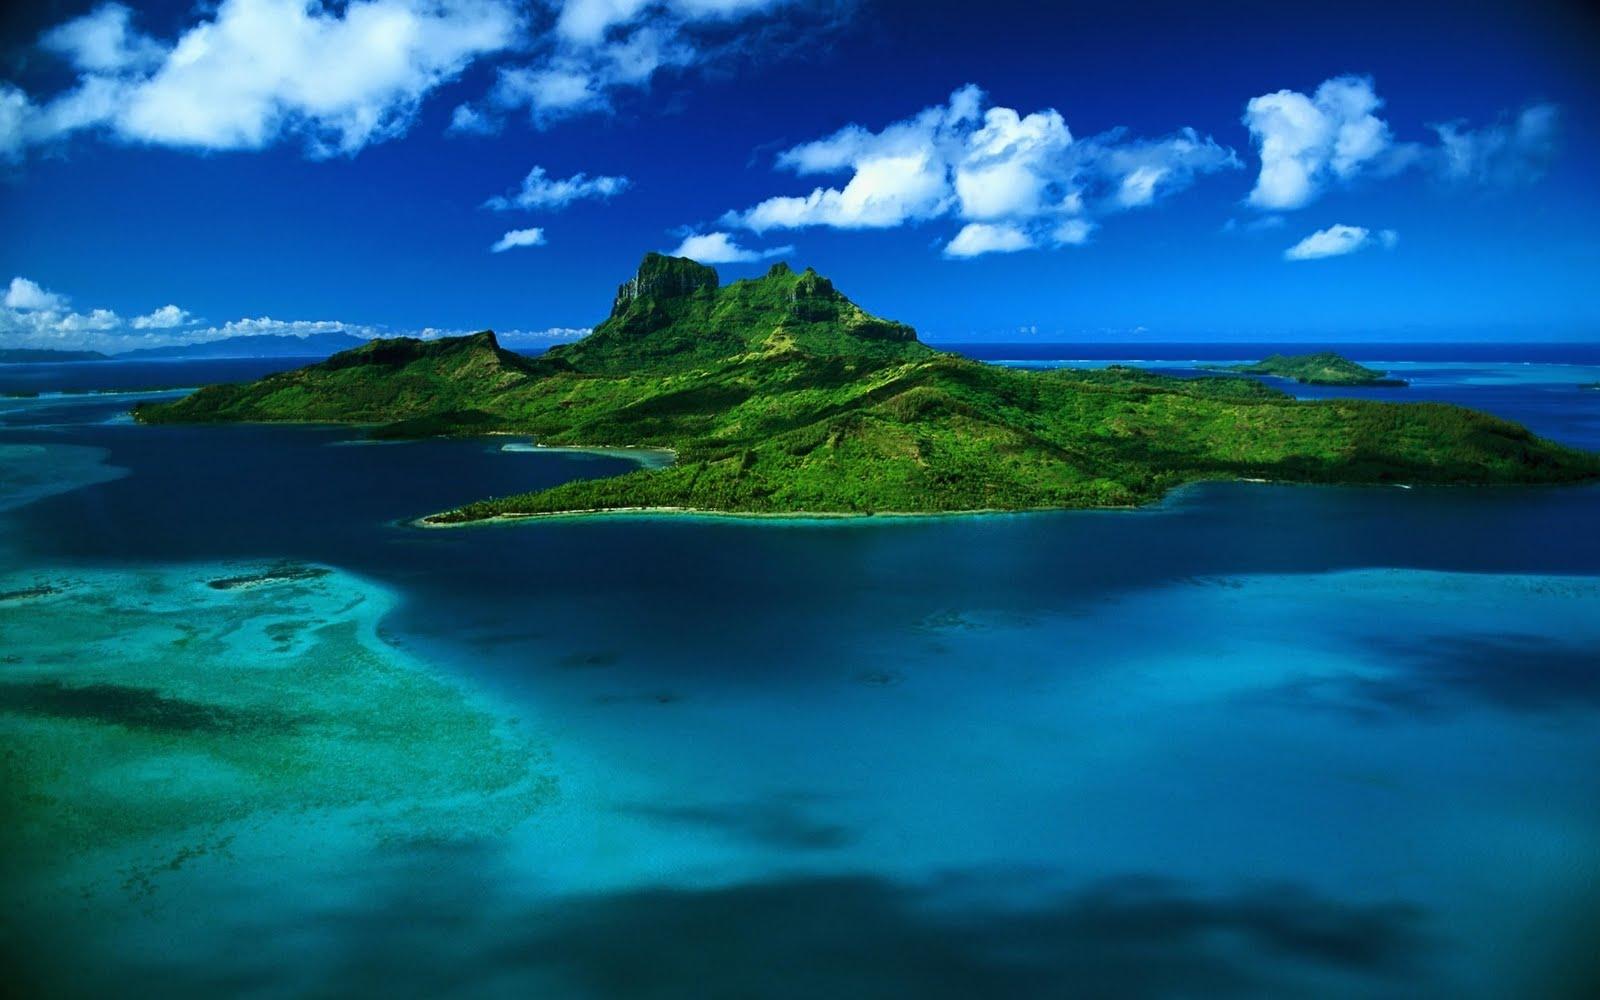 http://1.bp.blogspot.com/_EZ16vWYvHHg/TVBOPt9Q5GI/AAAAAAAAW9Y/Ki4EVDI5W4M/s1600/www.BancodeImagenesGratuitas.com%2B-mauritius-island-%2BIsla%2BMauricio.jpg